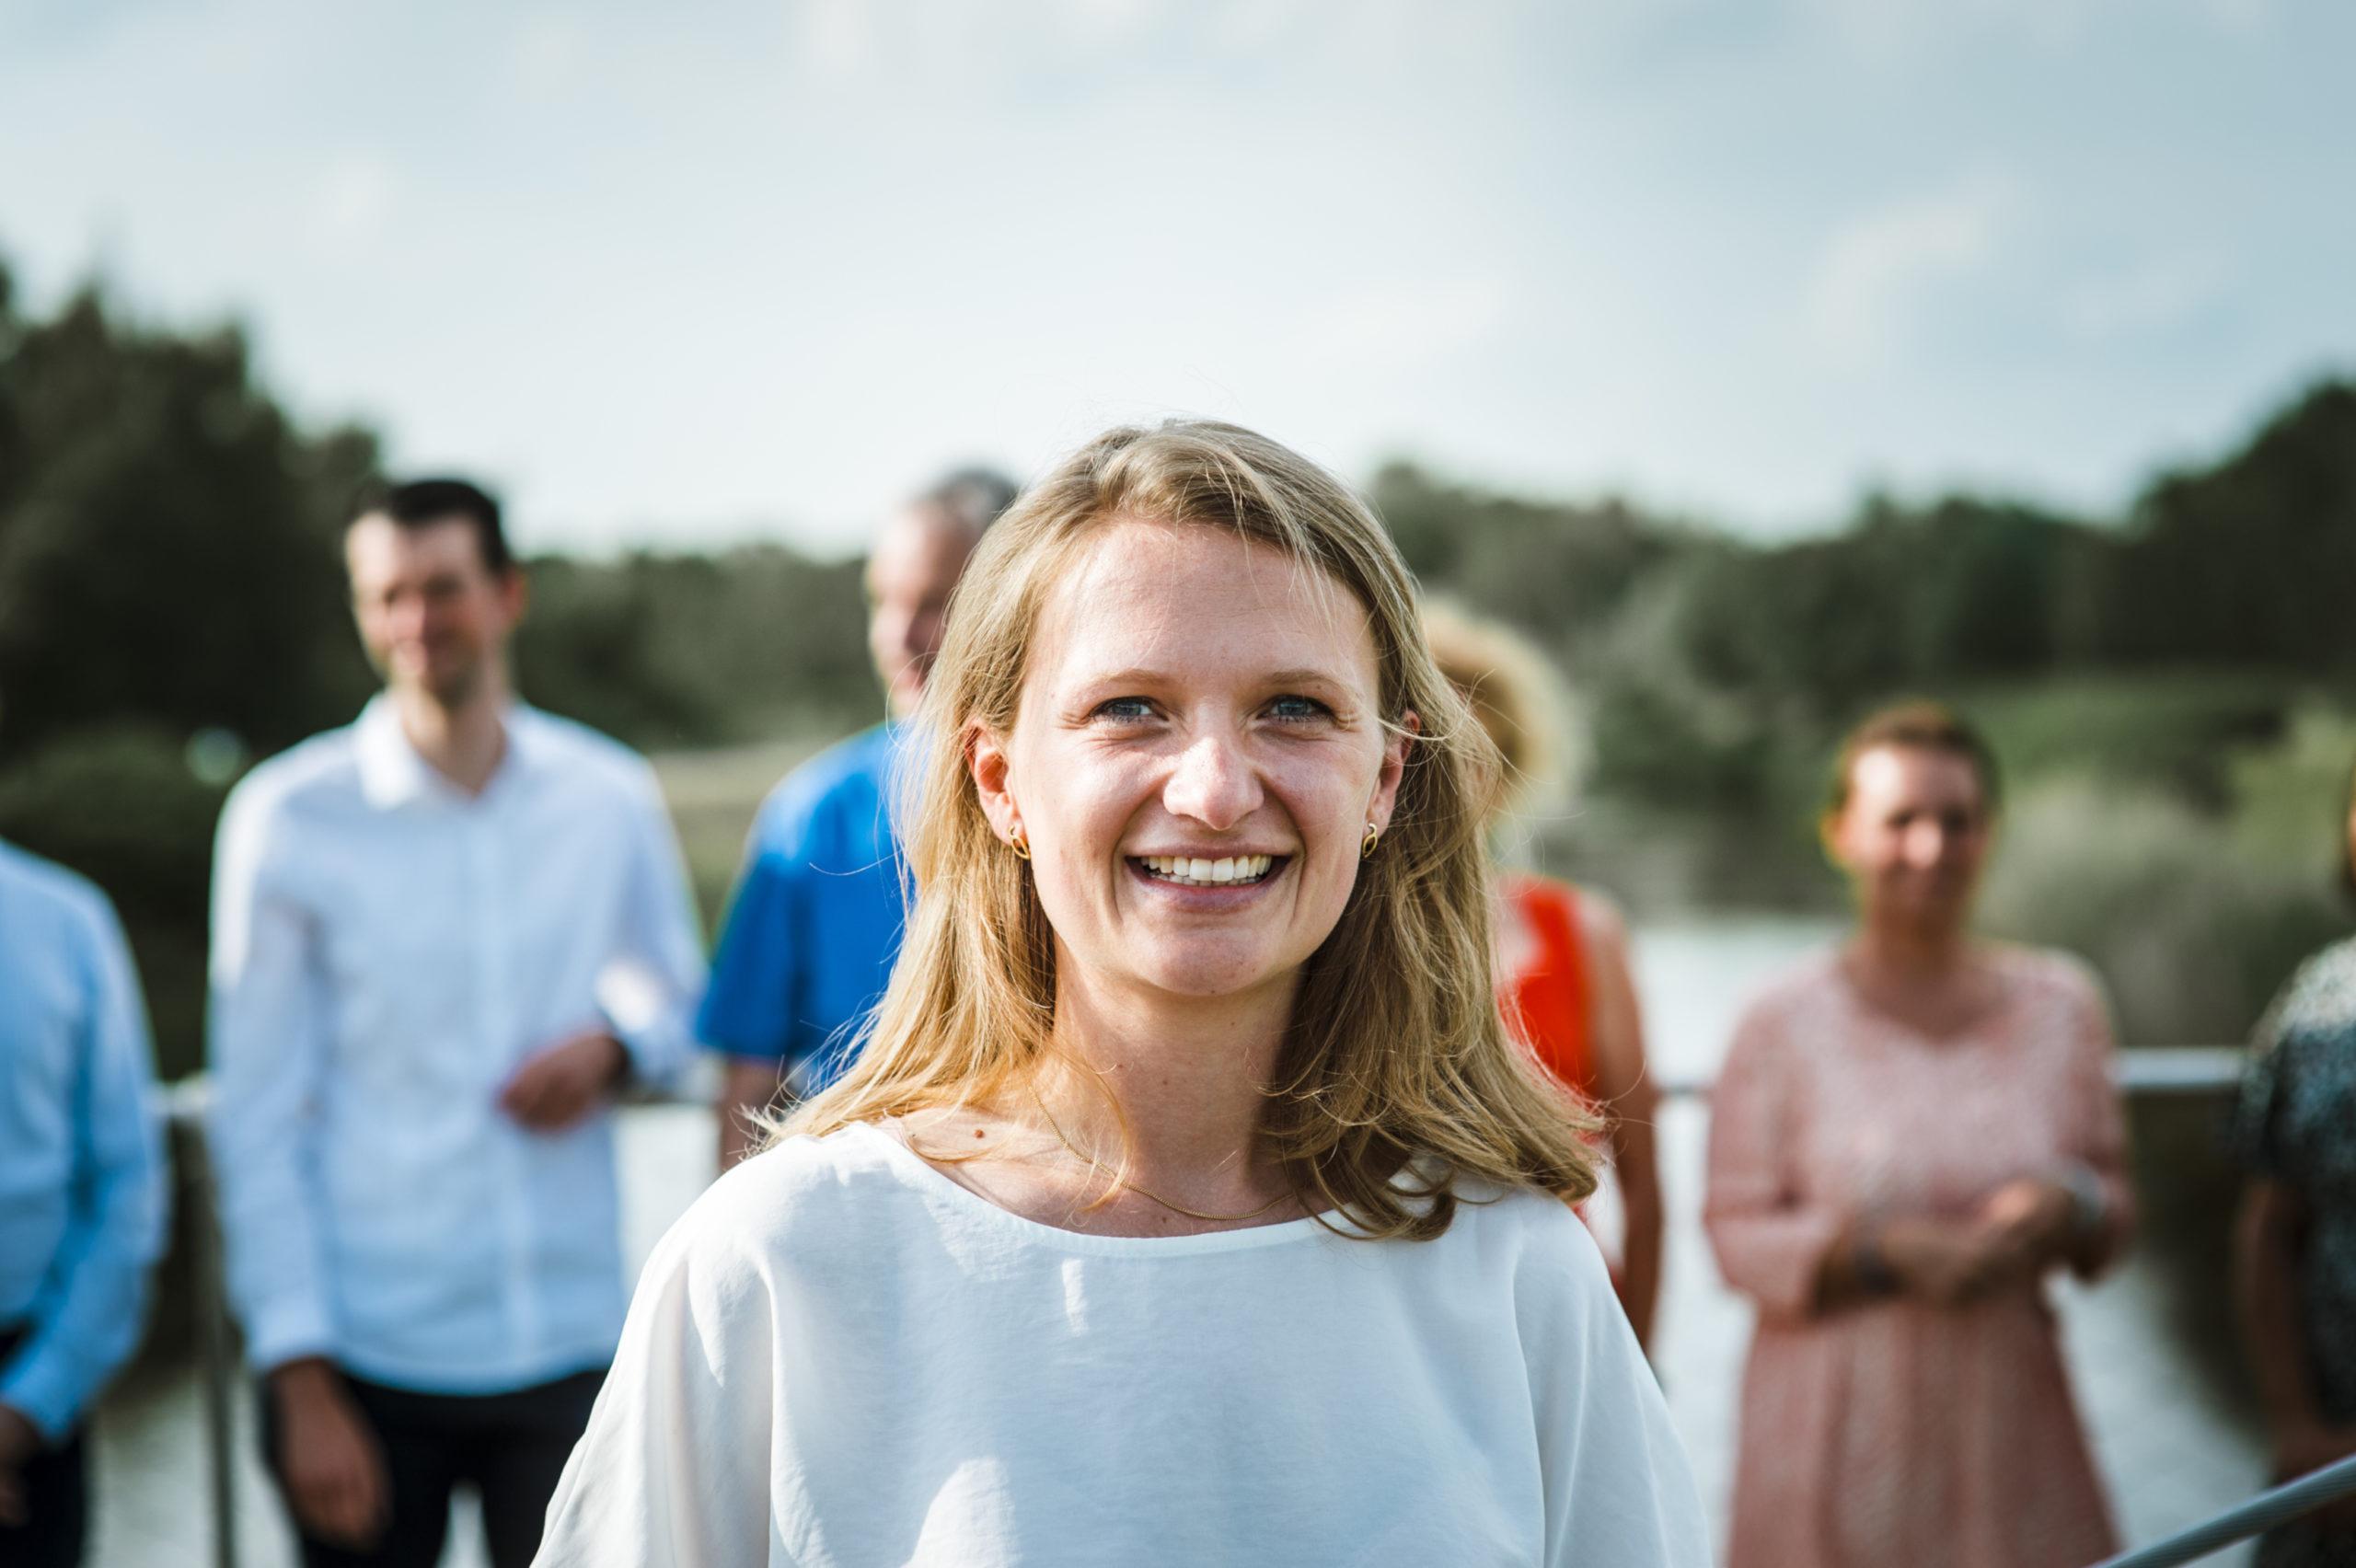 Dr. Nathalie Saeys